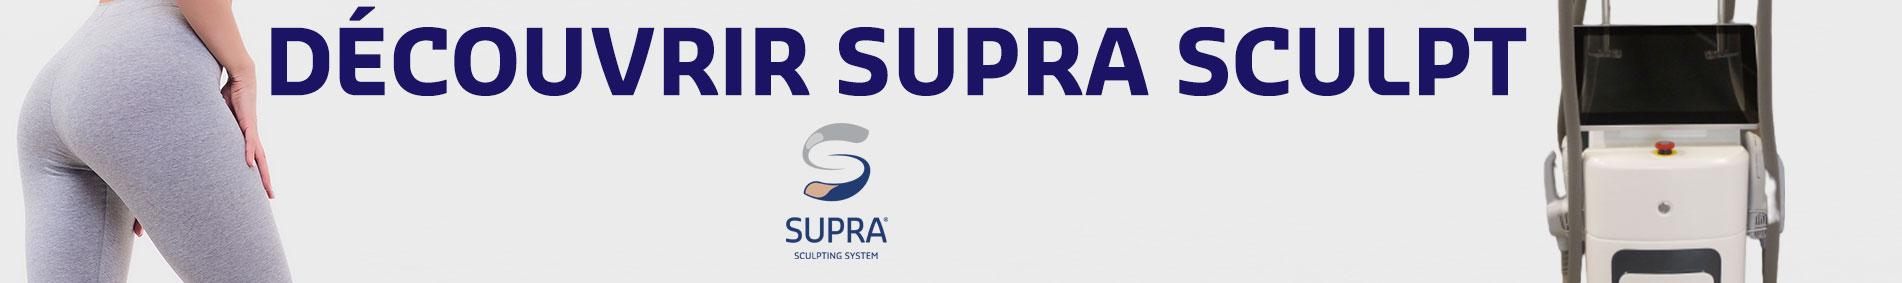 appareil supra sculpt